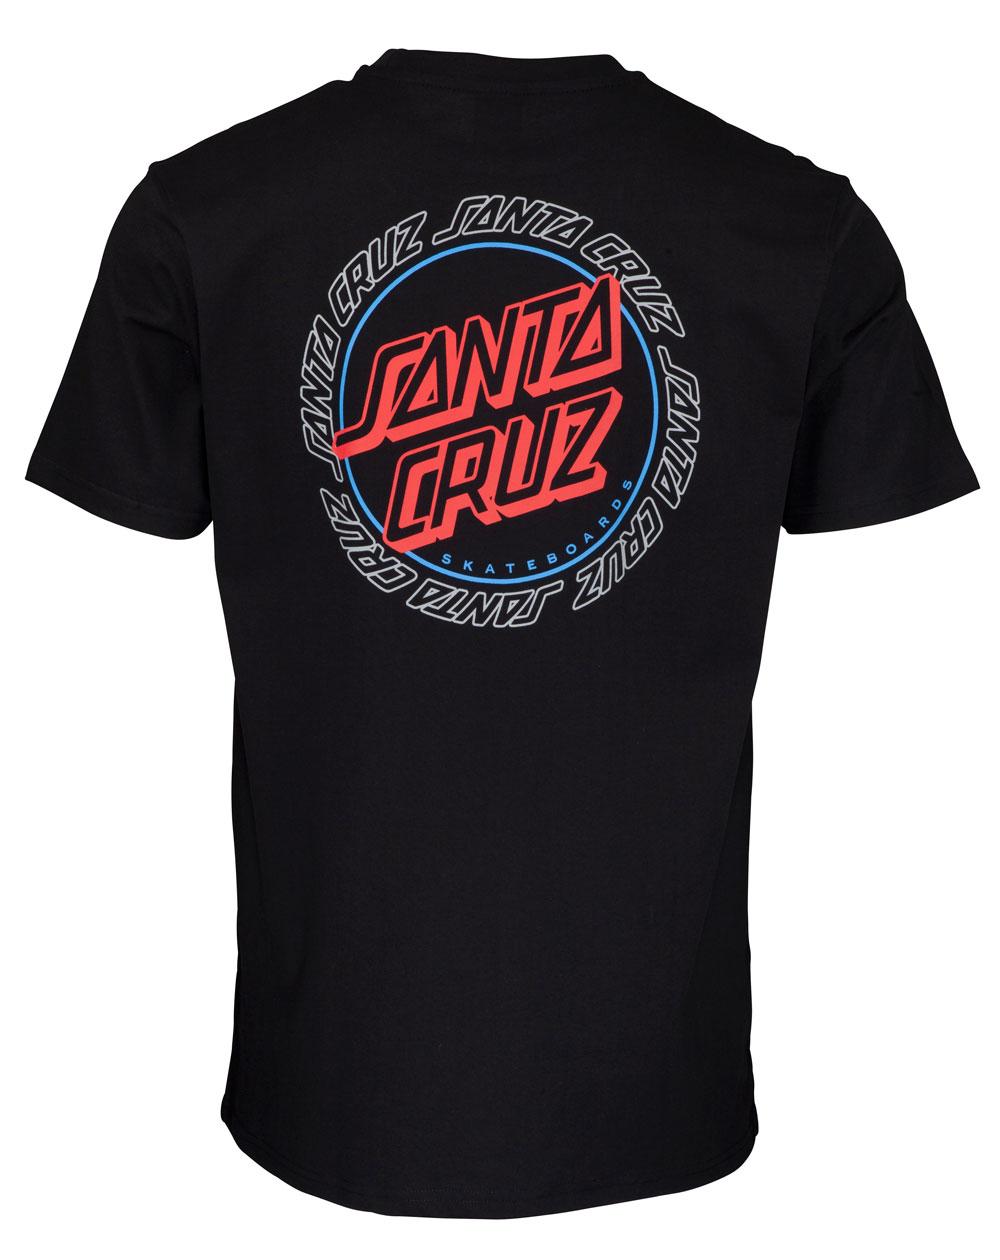 Santa Cruz Men's T-Shirt Hollow Ring Dot Black